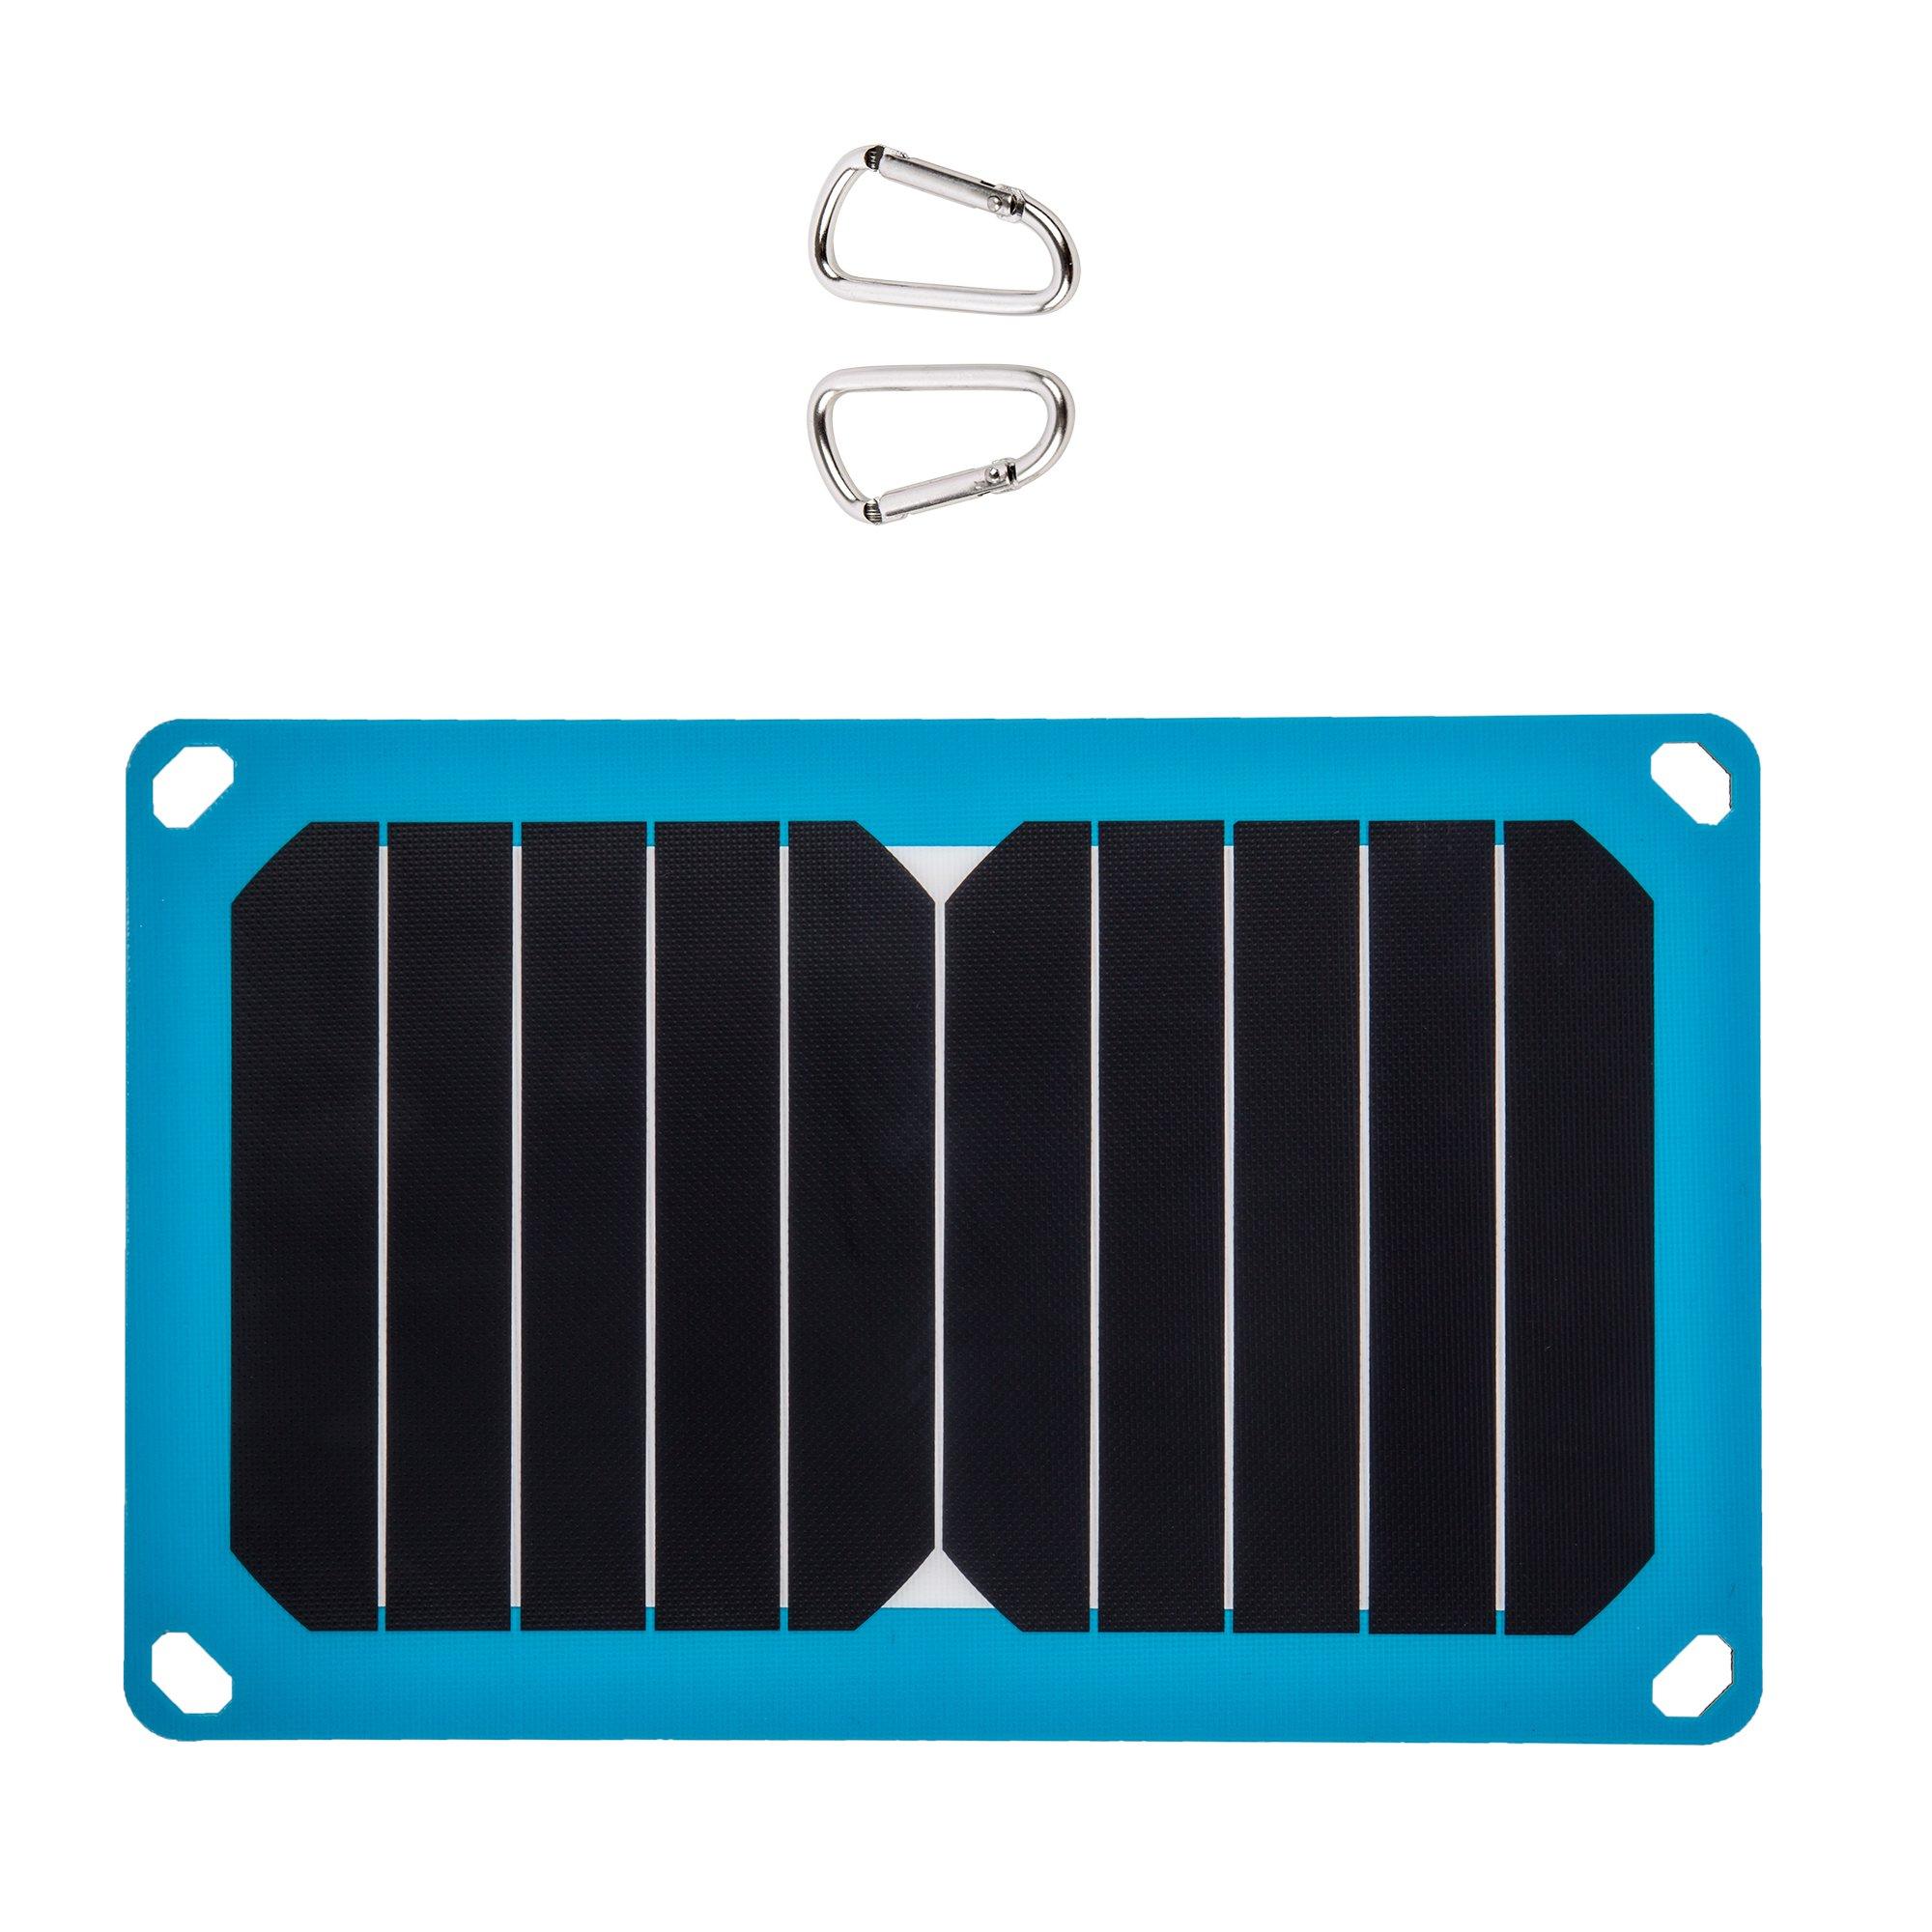 Renogy E.Flex 5W Portable Solar Panel with USB Port